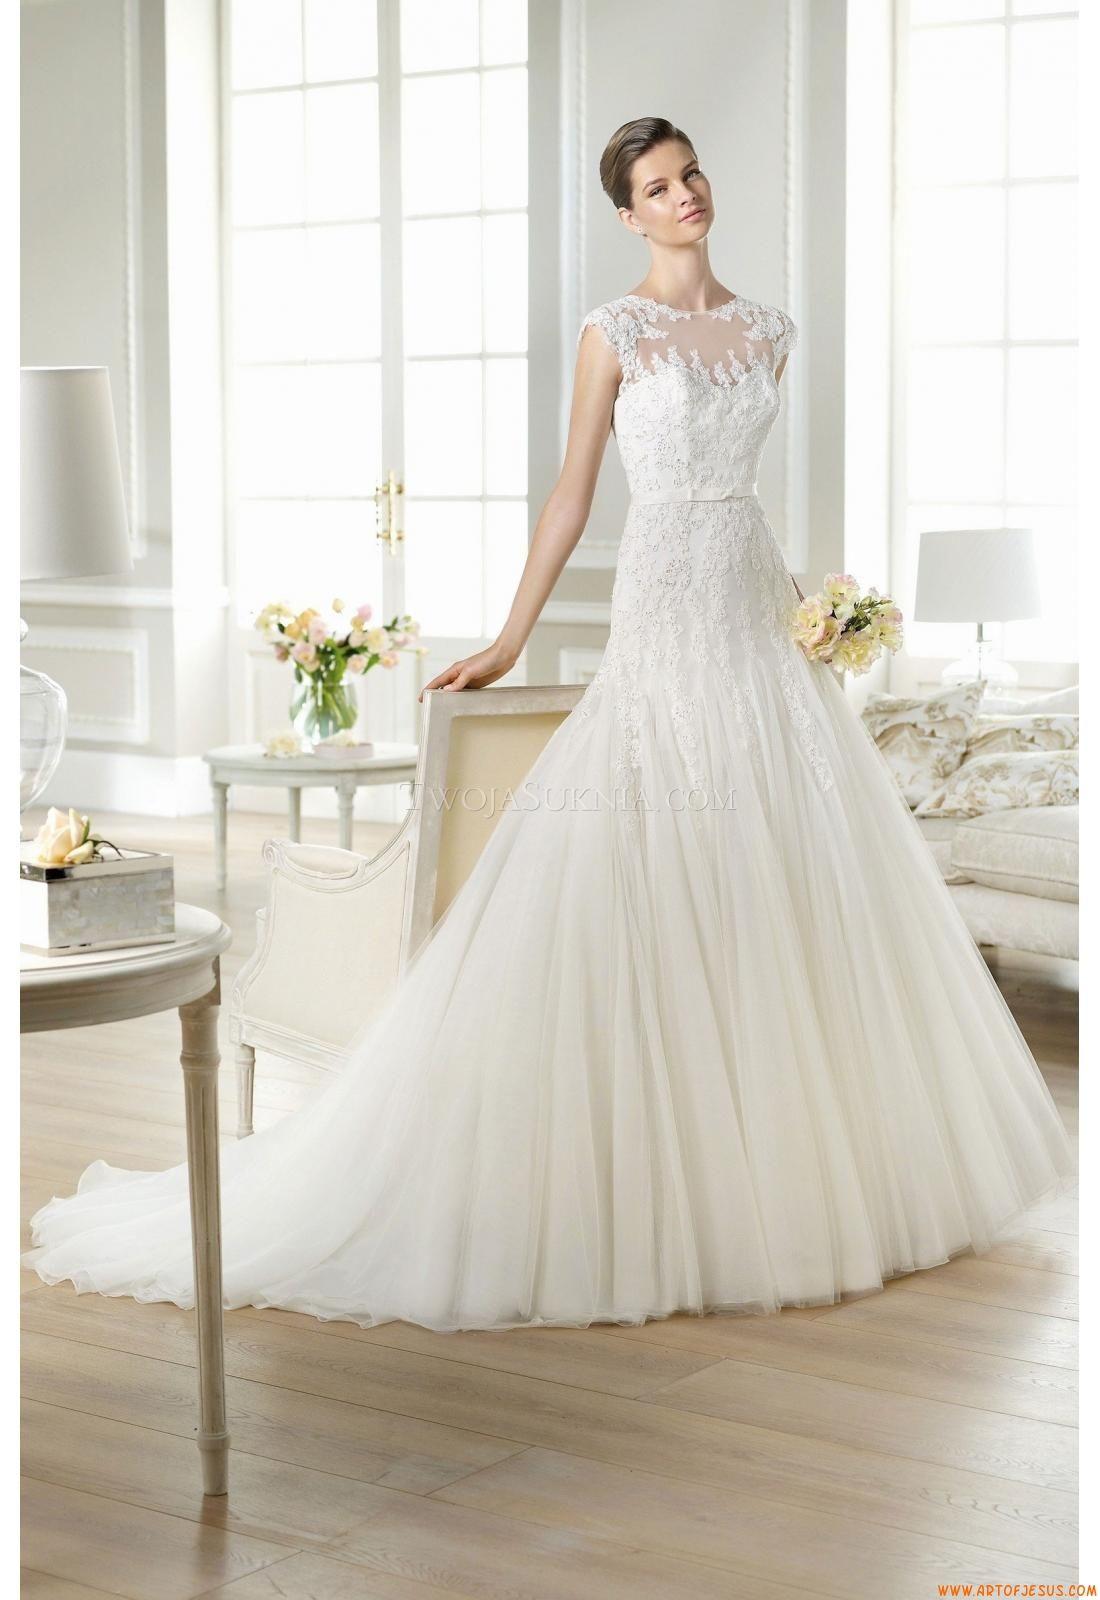 Wedding Dresses White One Jael 2014 Wedding Dresses Online